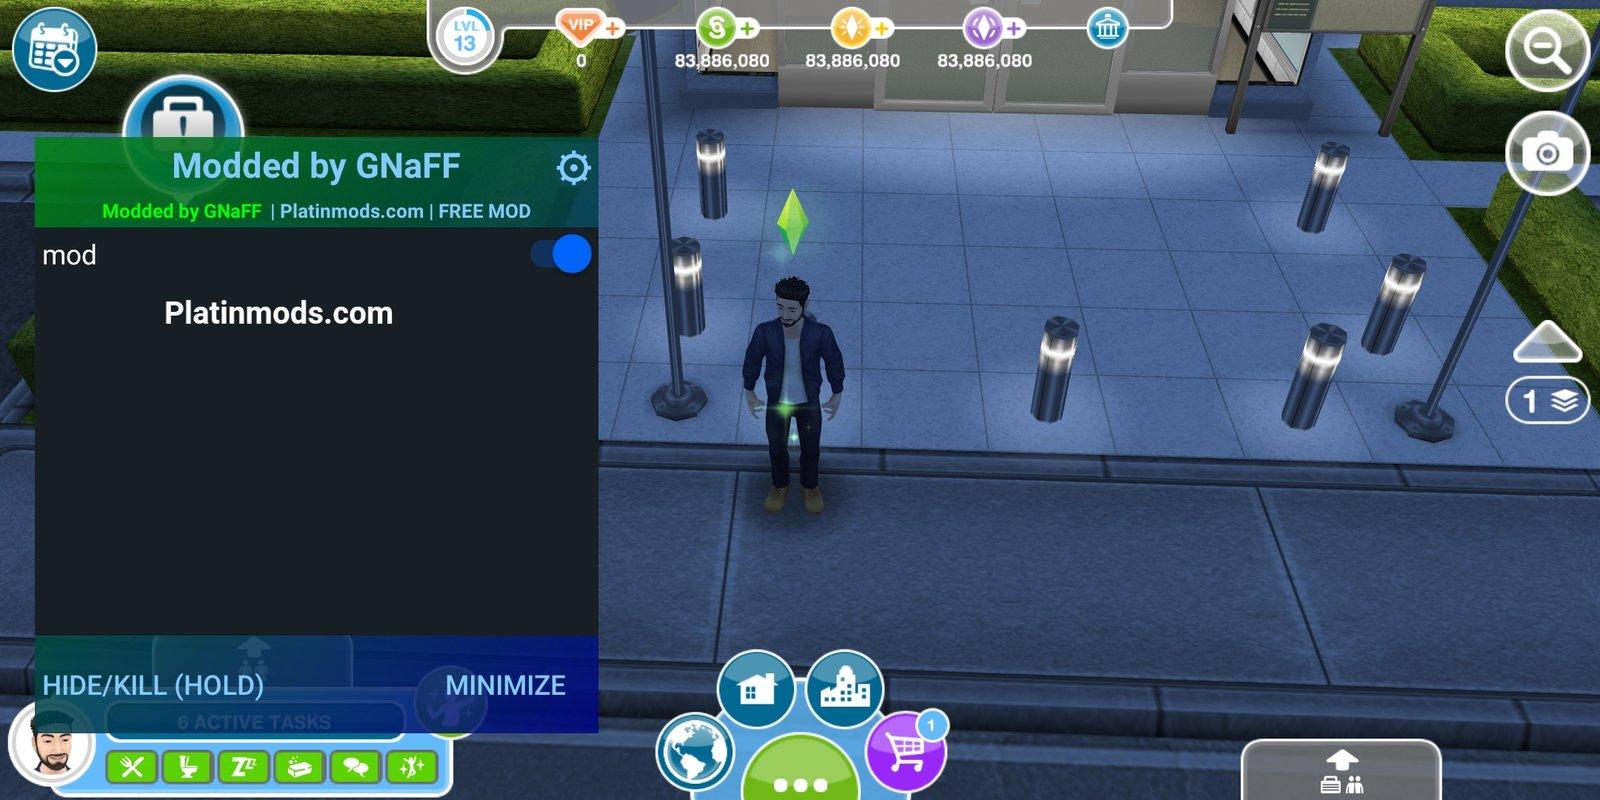 Screenshot_2021-05-15-00-18-14-385_com.ea.games.simsfreeplay_row.jpg